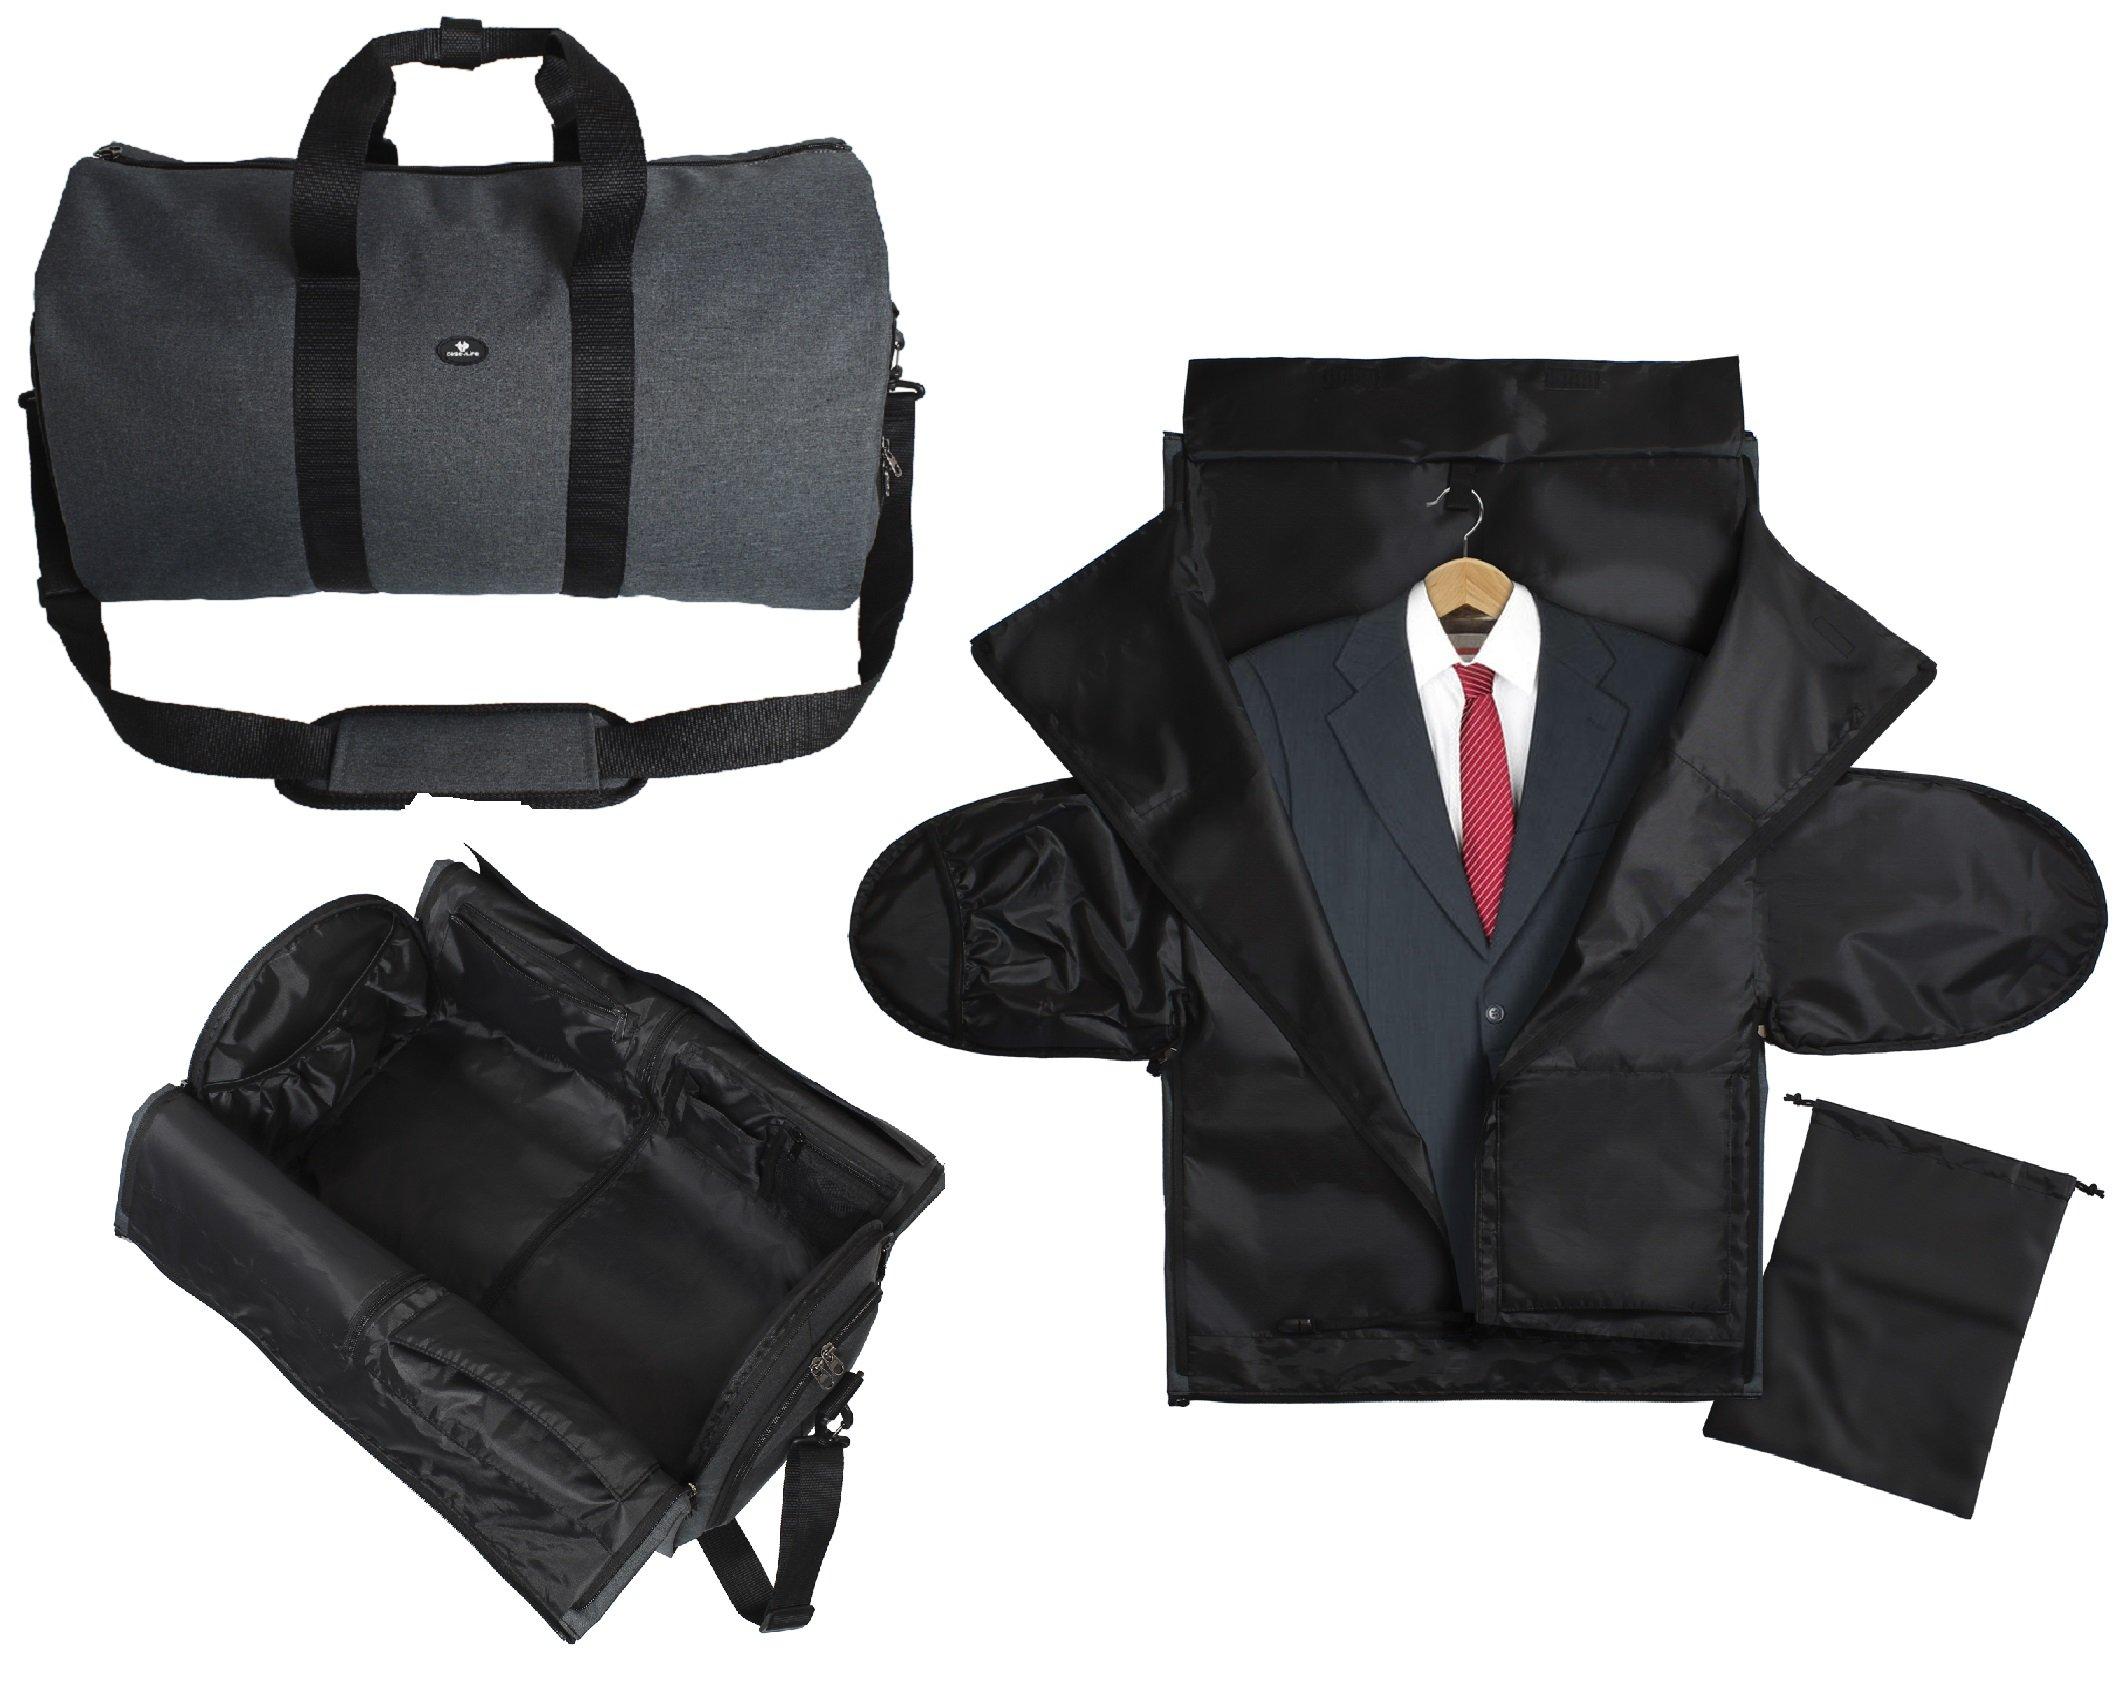 Slate Travel LinkSeal Mesh Shoe Bag Portable /& Waterproof with Zipper